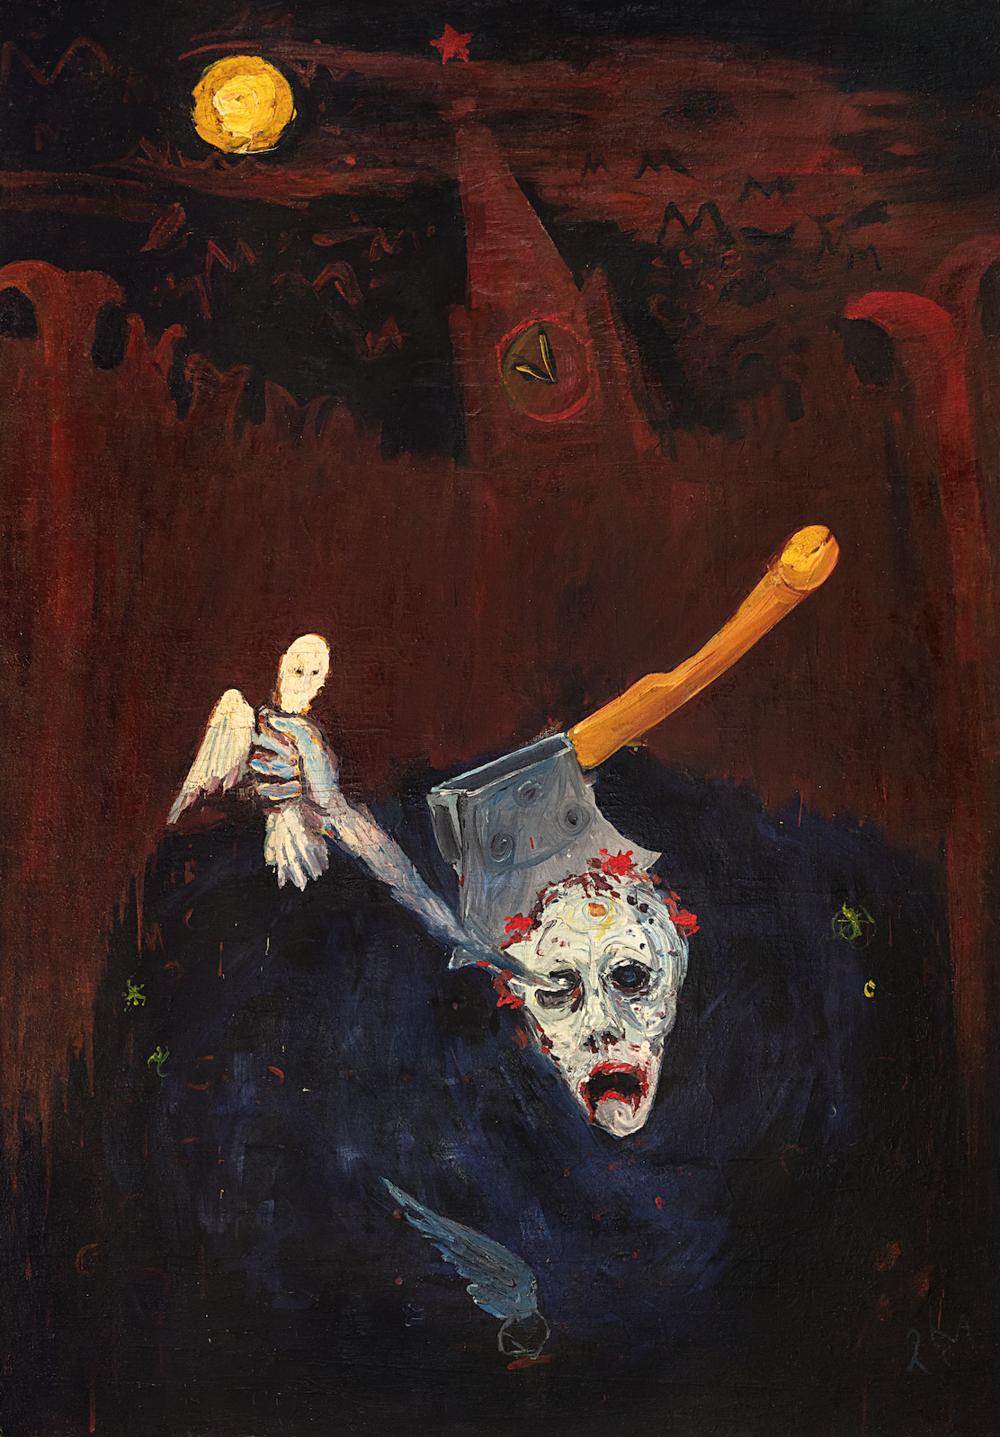 Страта (MOSCOW над нами), 1989